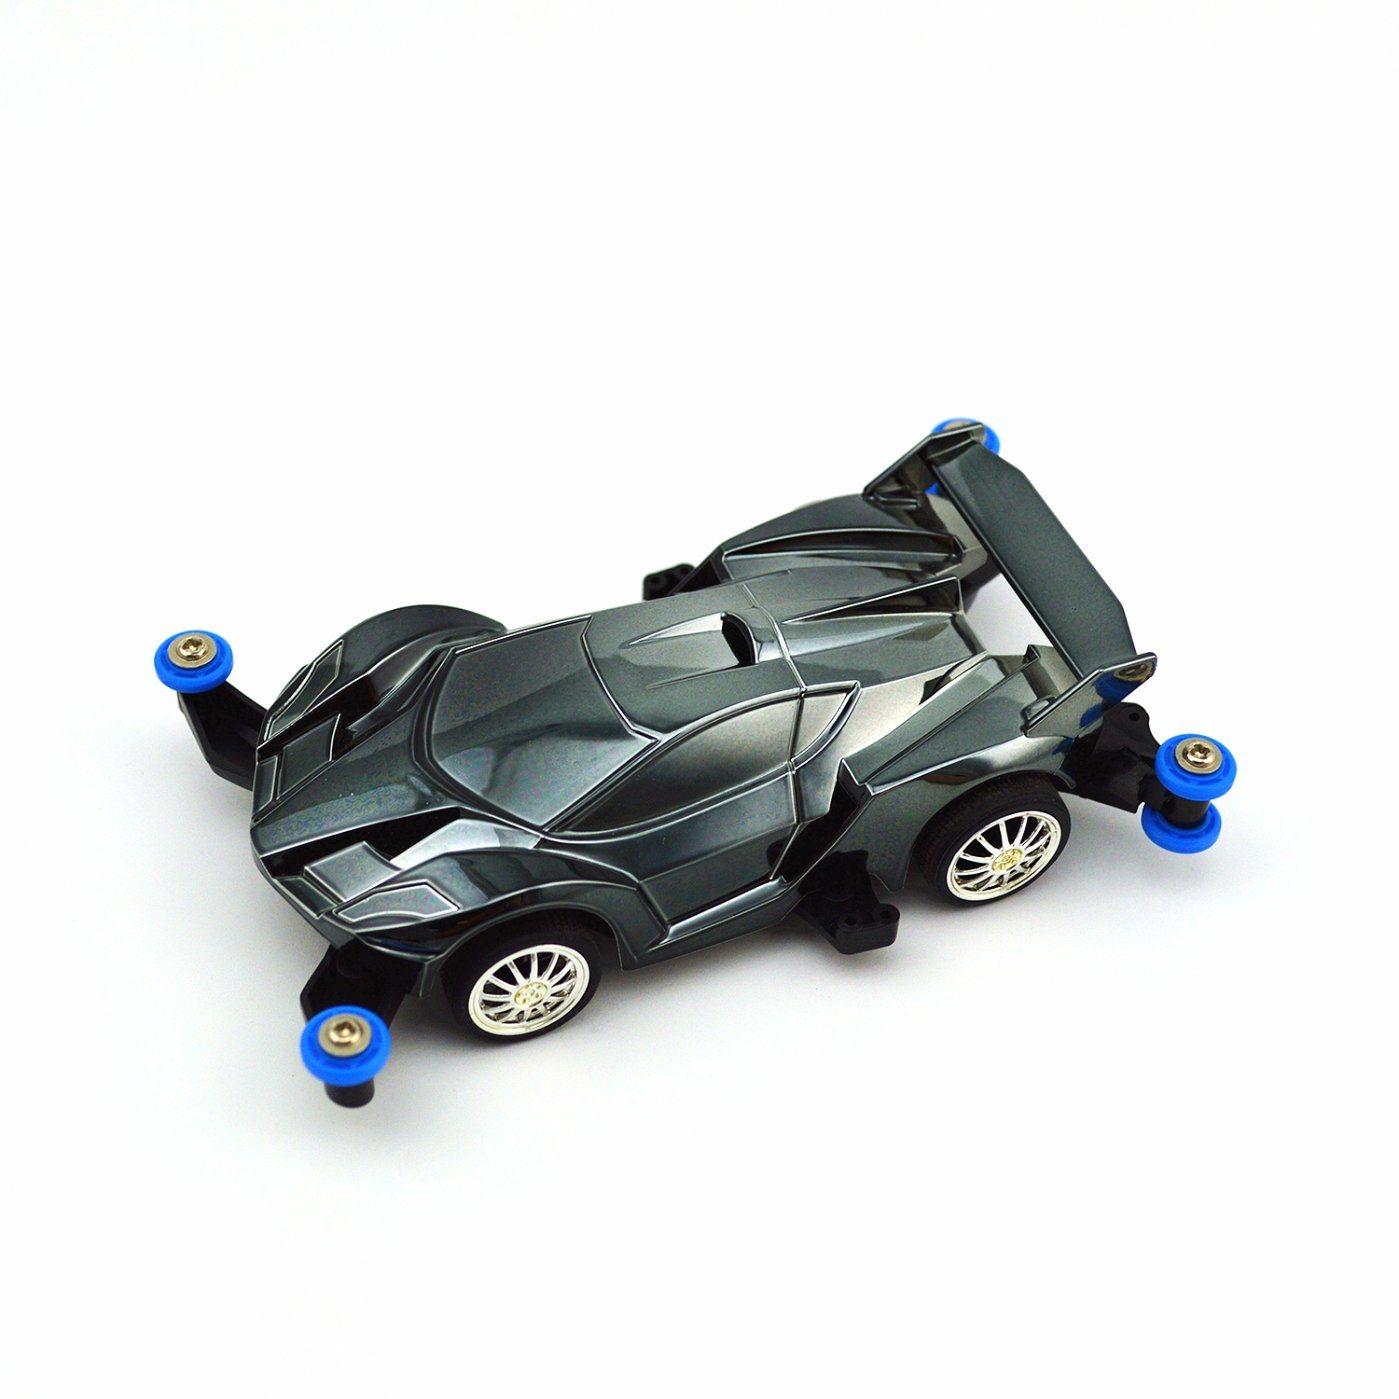 Toy Car Toys Disney Pixar Cars 3 Lightning Mcqueen 1 55 Police Car